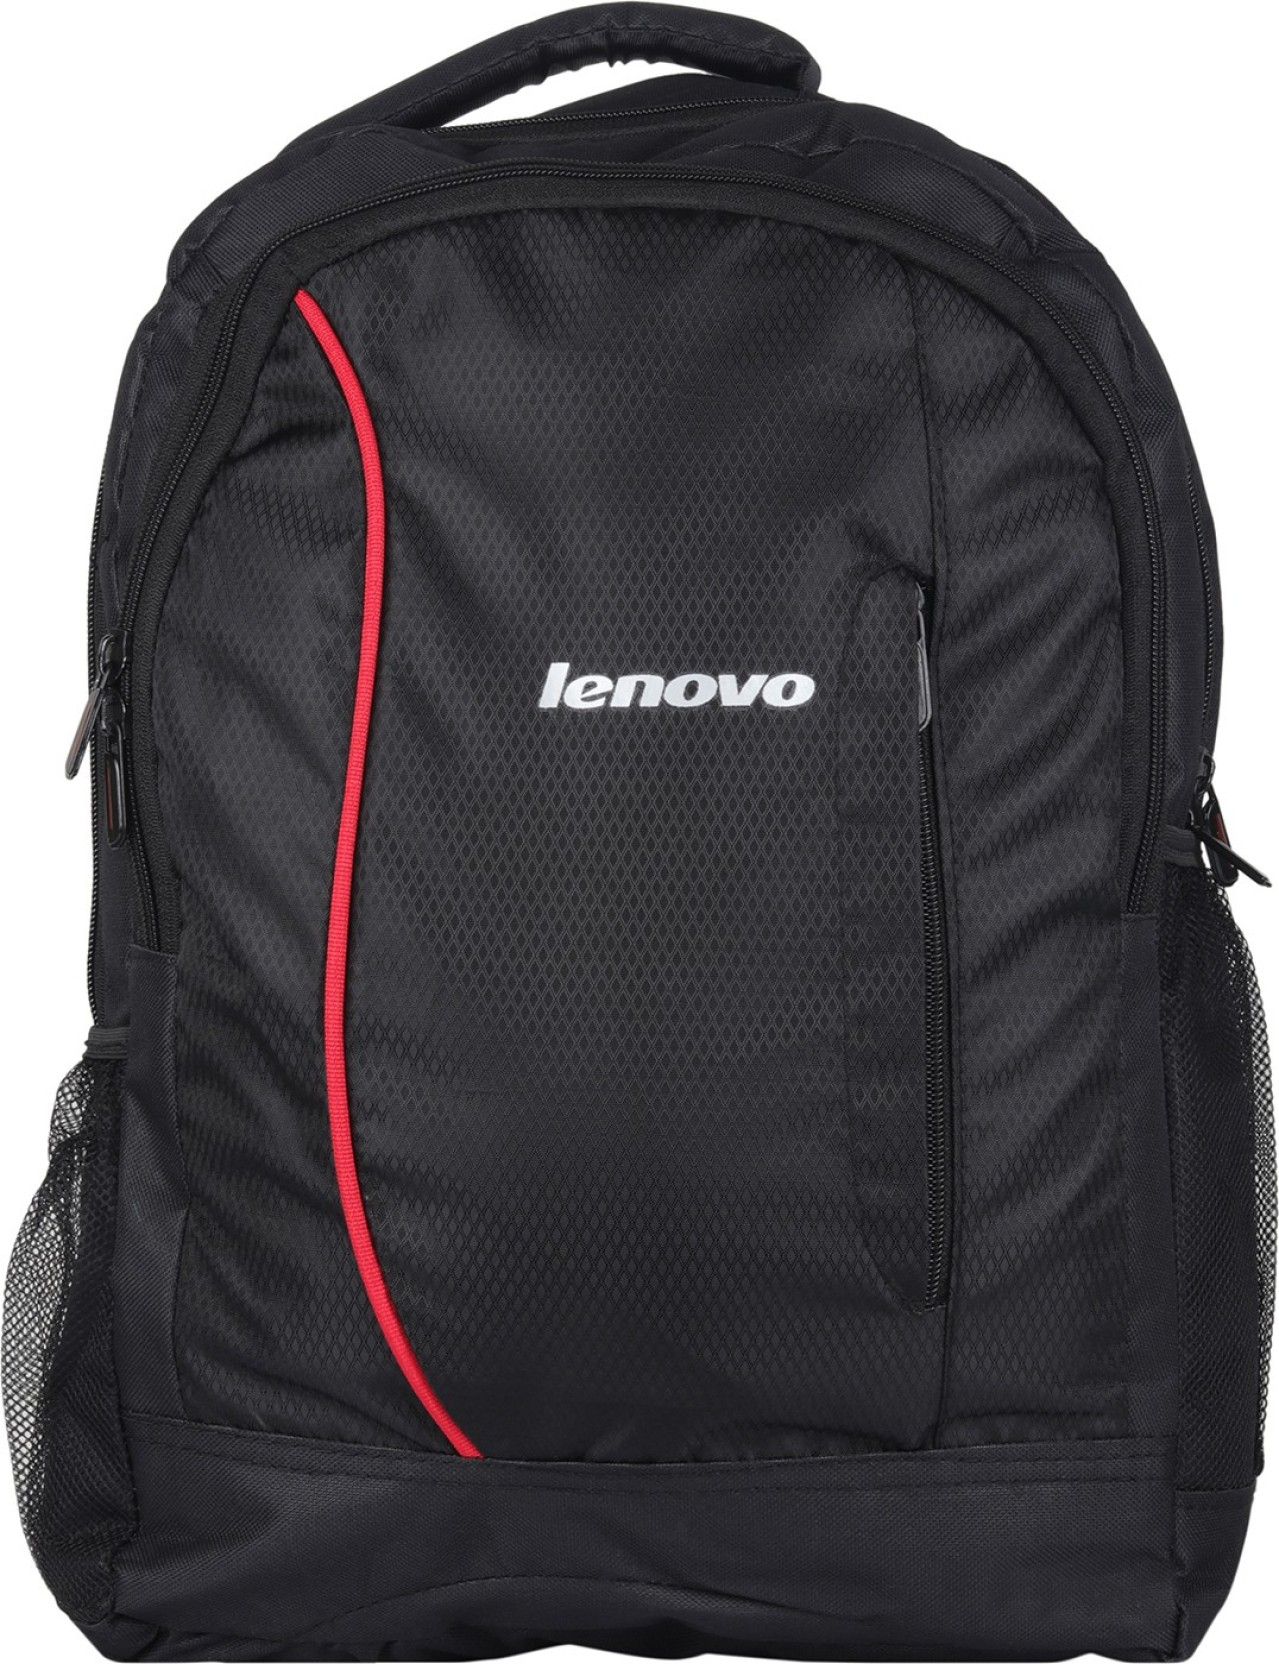 2b68087ffdfd Lenovo 14 inch Laptop Backpack Black - Price in India